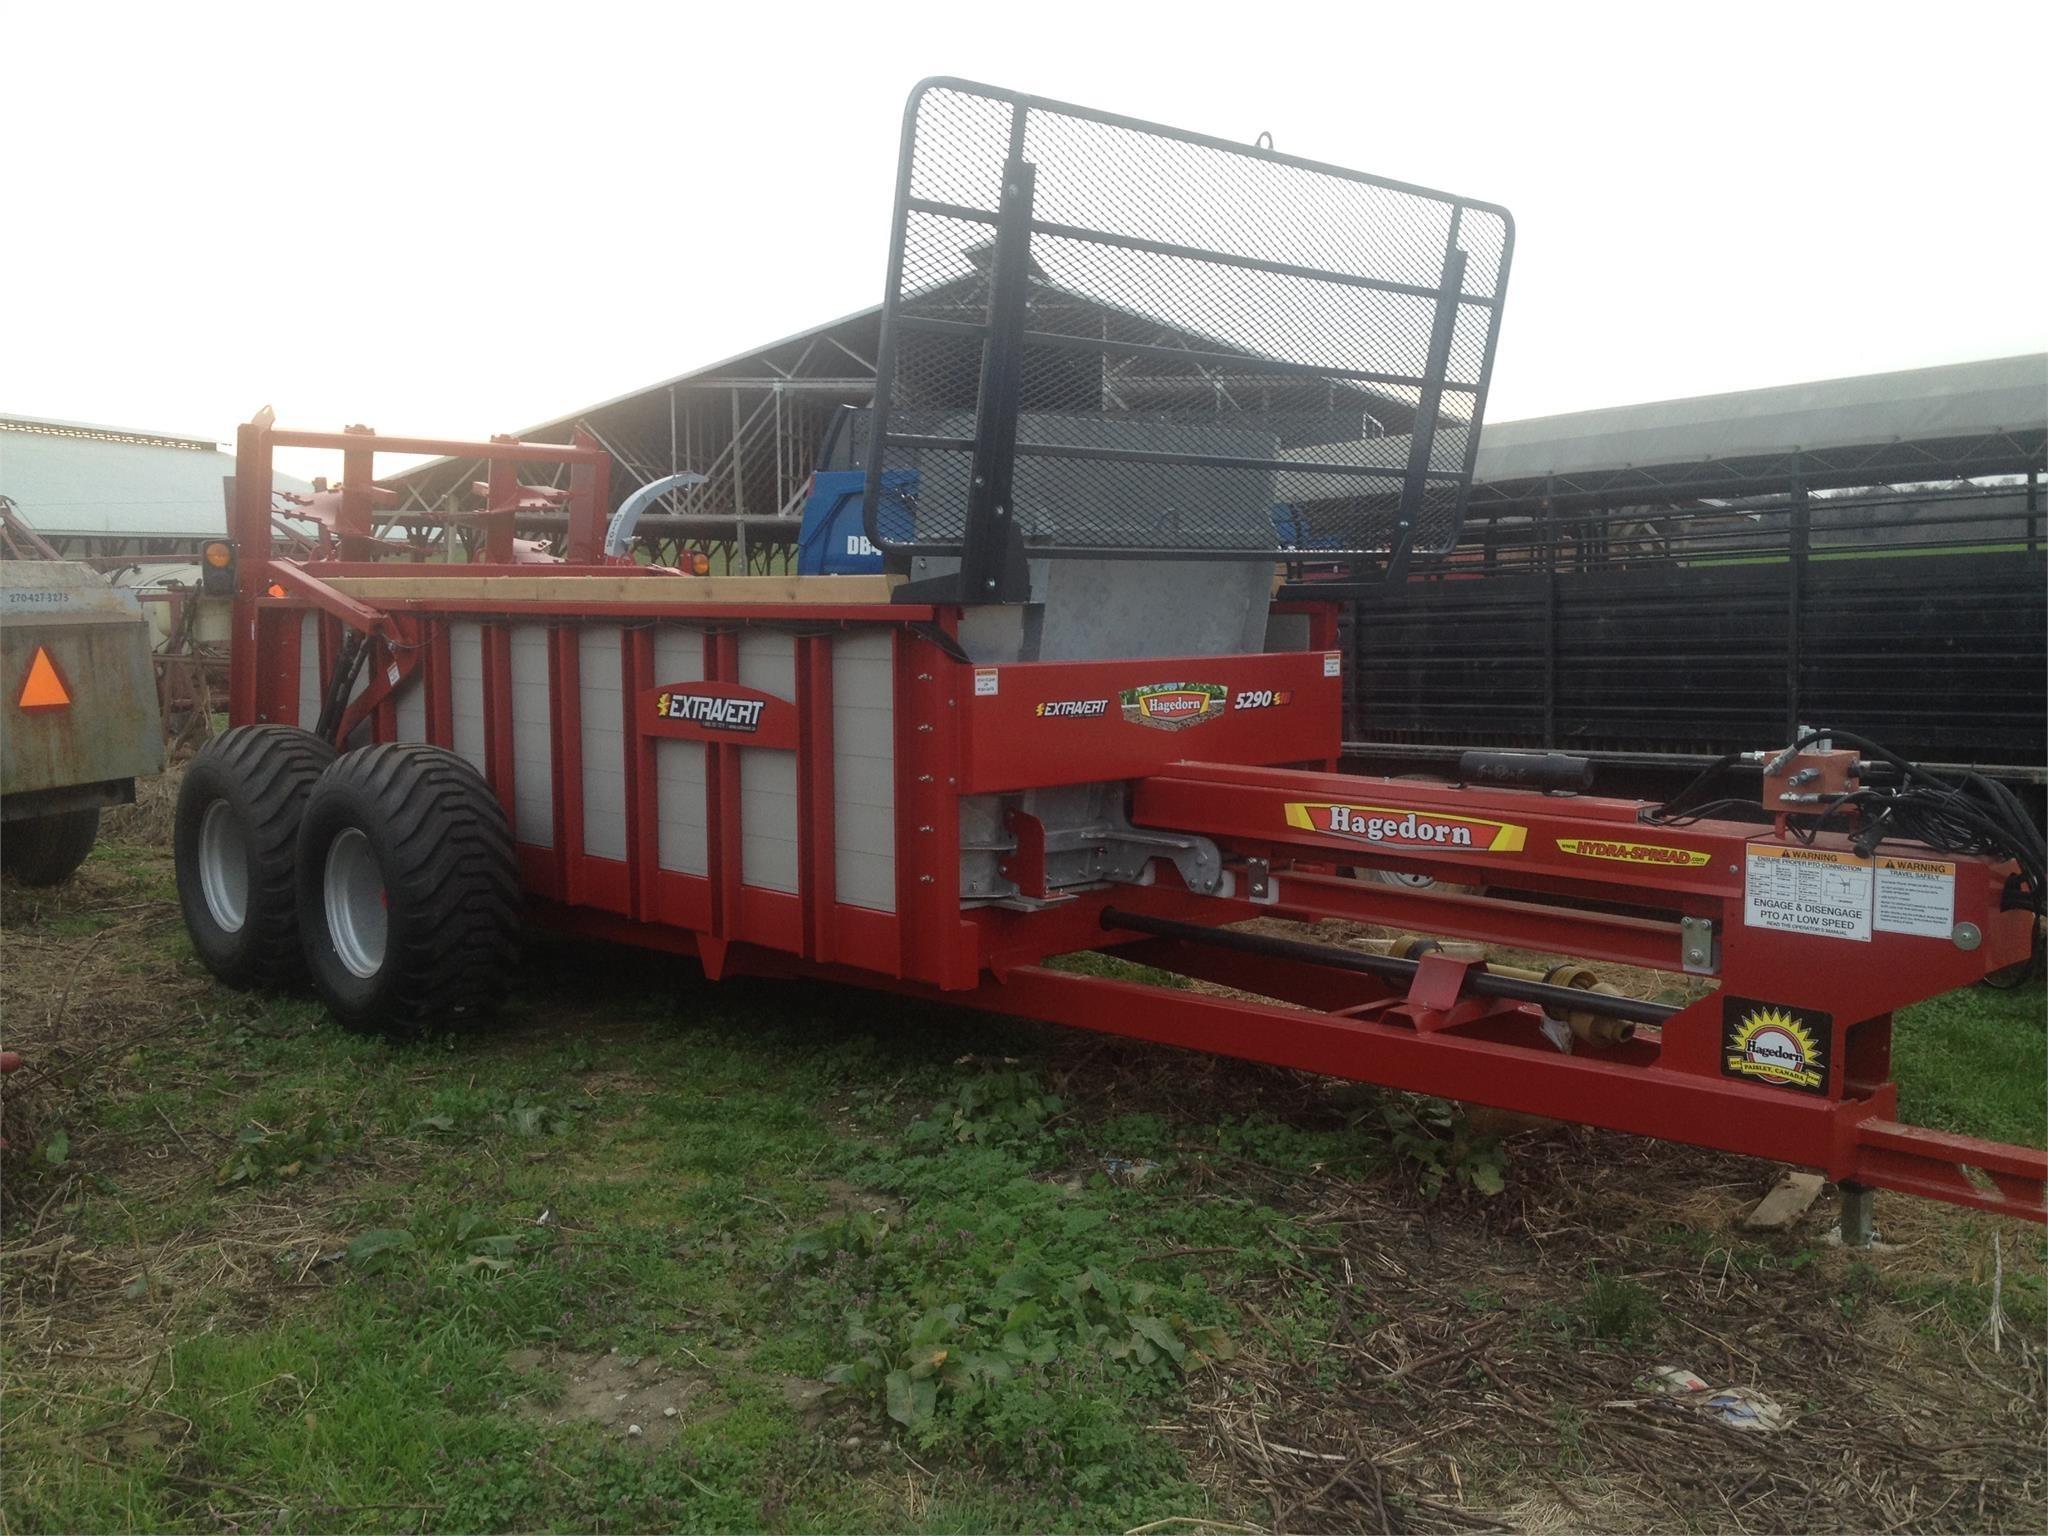 2020 Hagedorn Hydra-Spread Extravert 5290 Manure Spreader